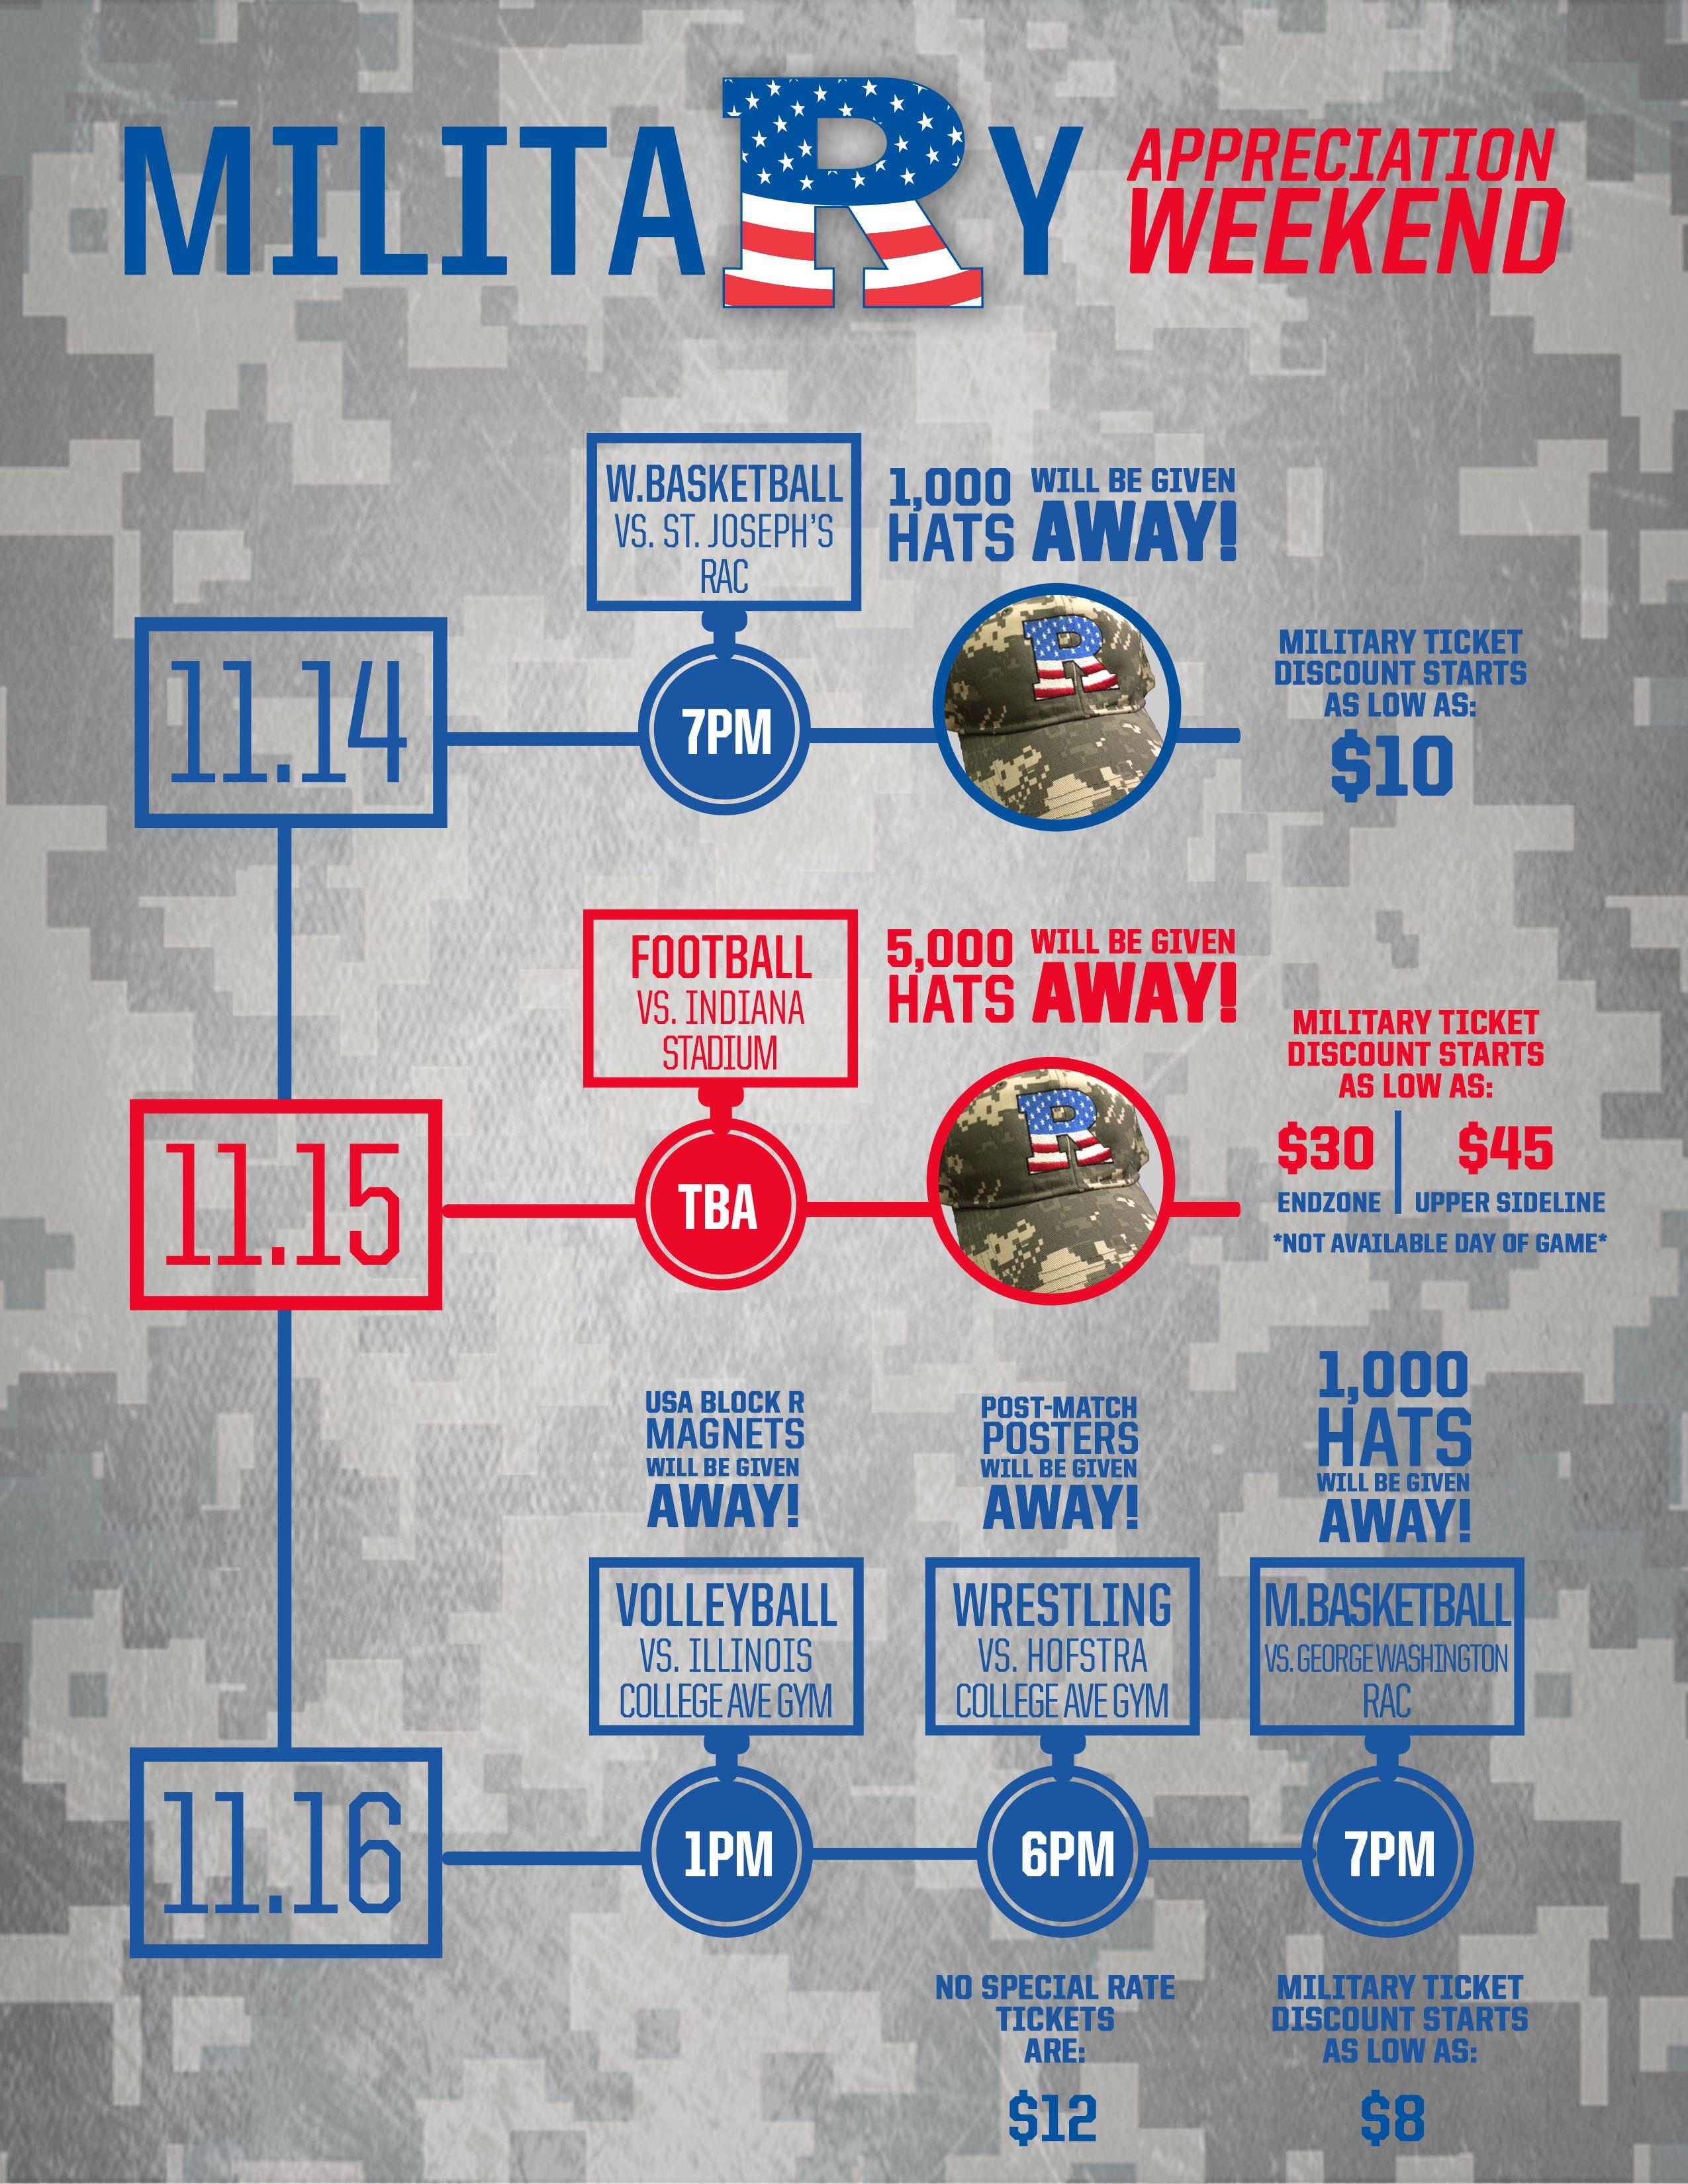 Your Weekend Timeline! MilitaryAppreciation